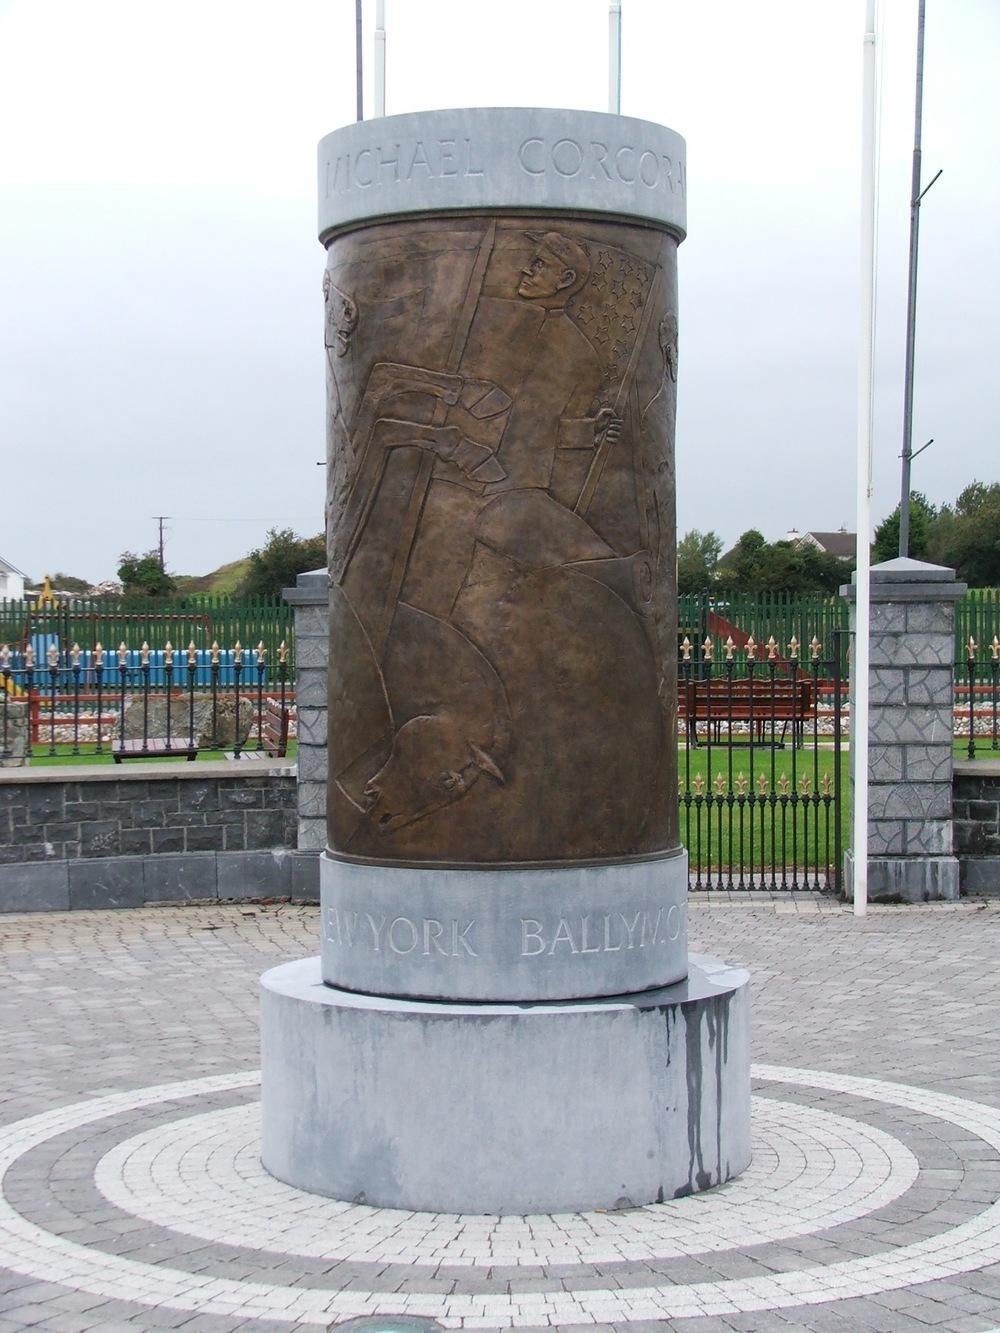 National Memorial to the Fighting 69th - Ballymote, County Sligo, Ireland